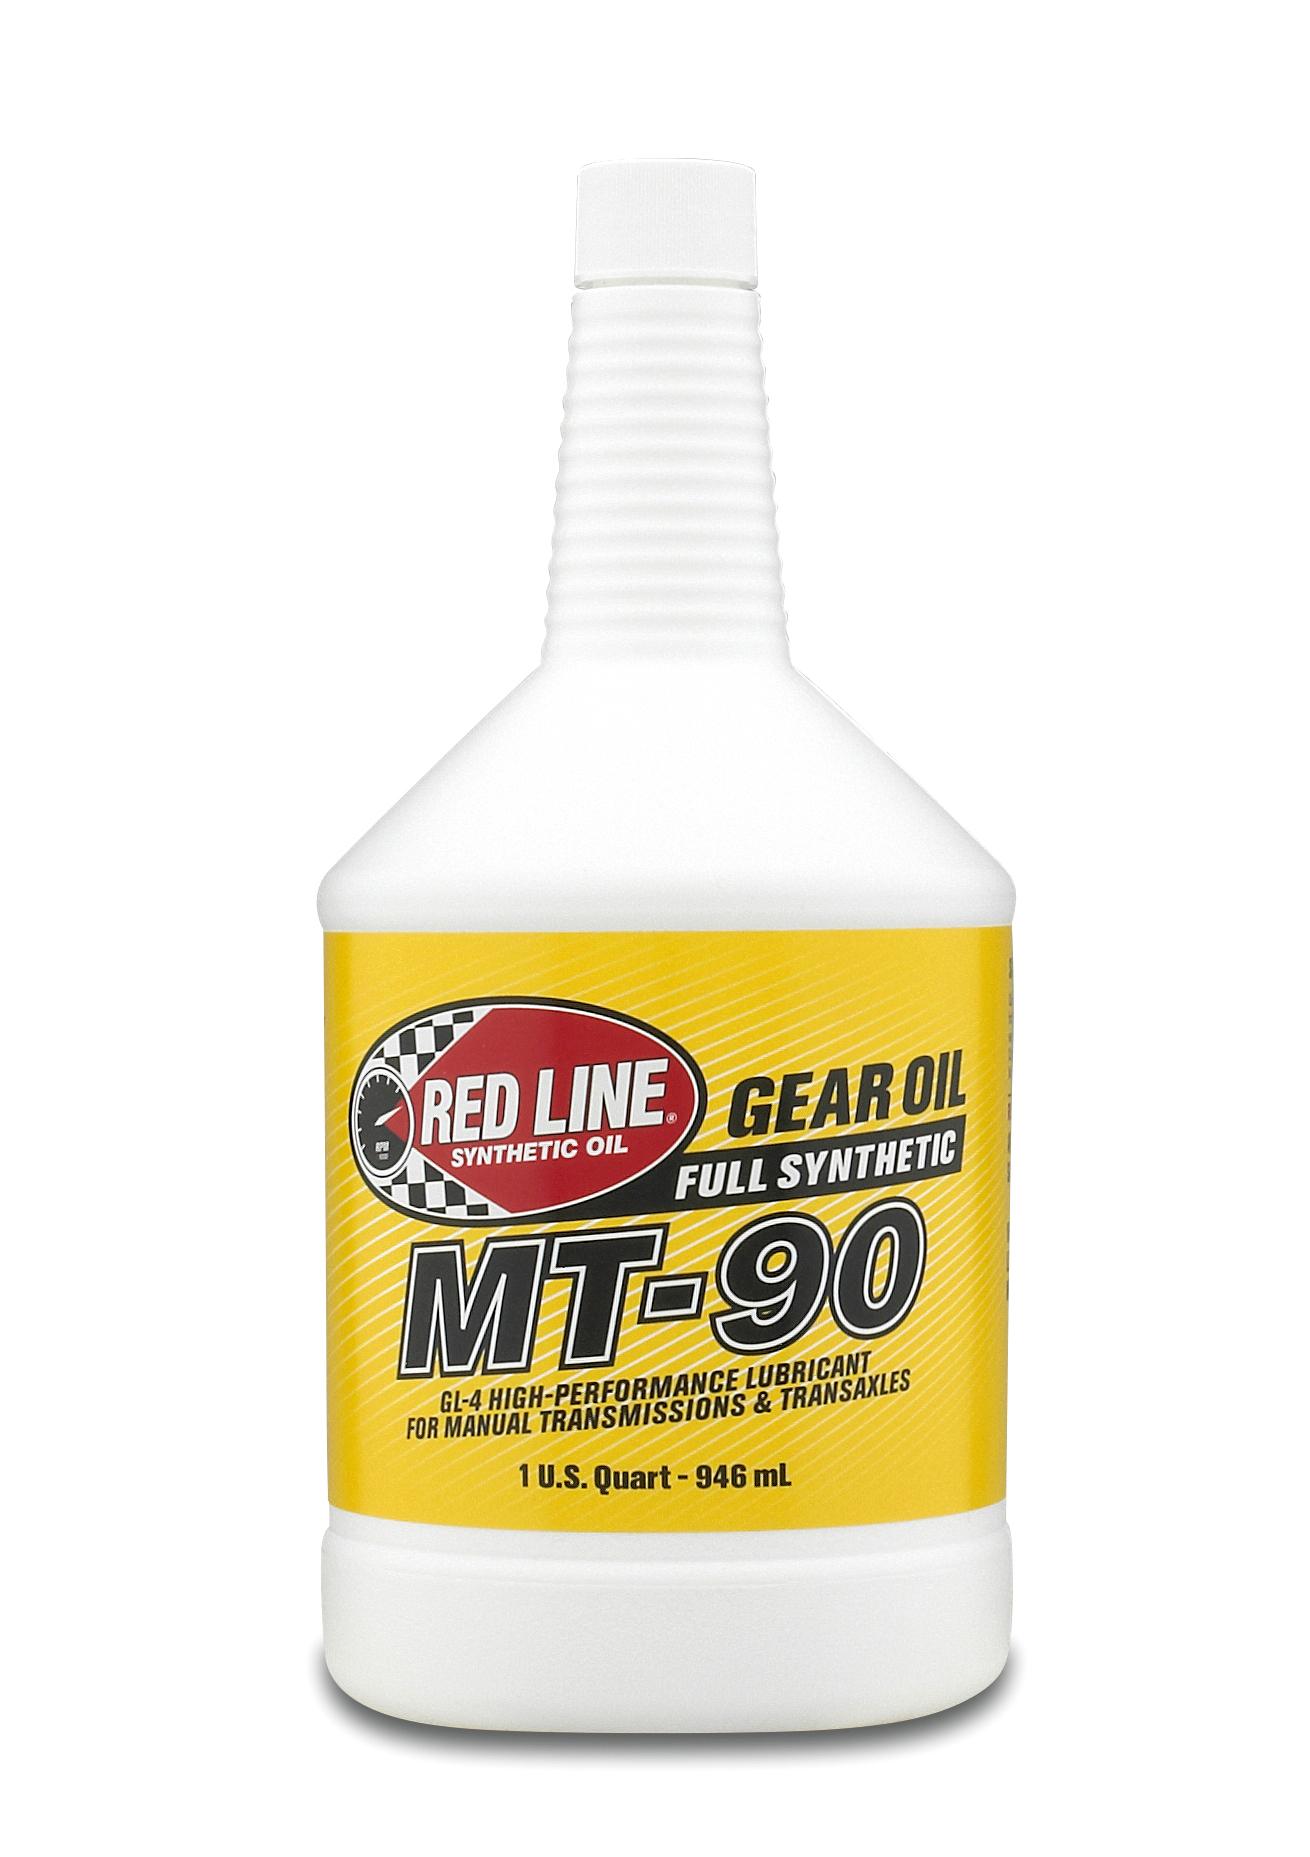 MT-90